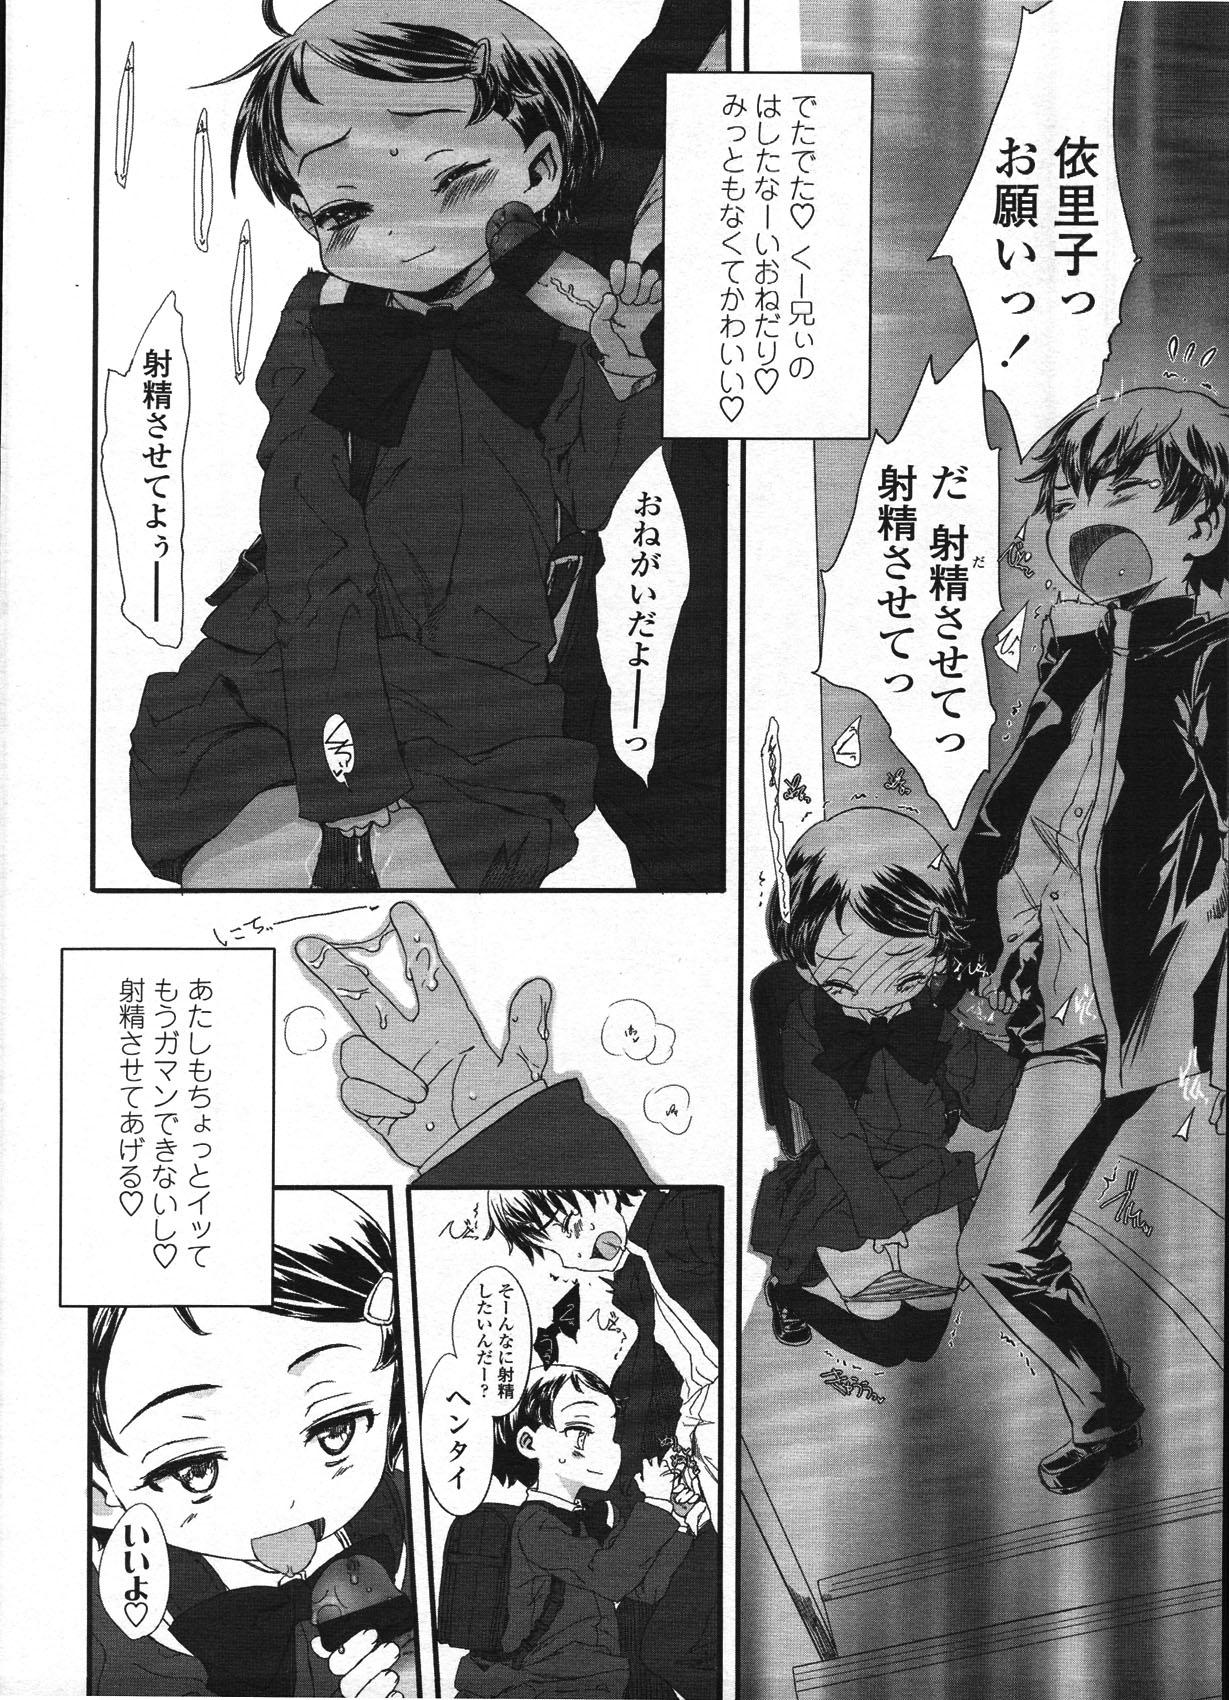 Comic LO 2009-04 Vol. 61 66